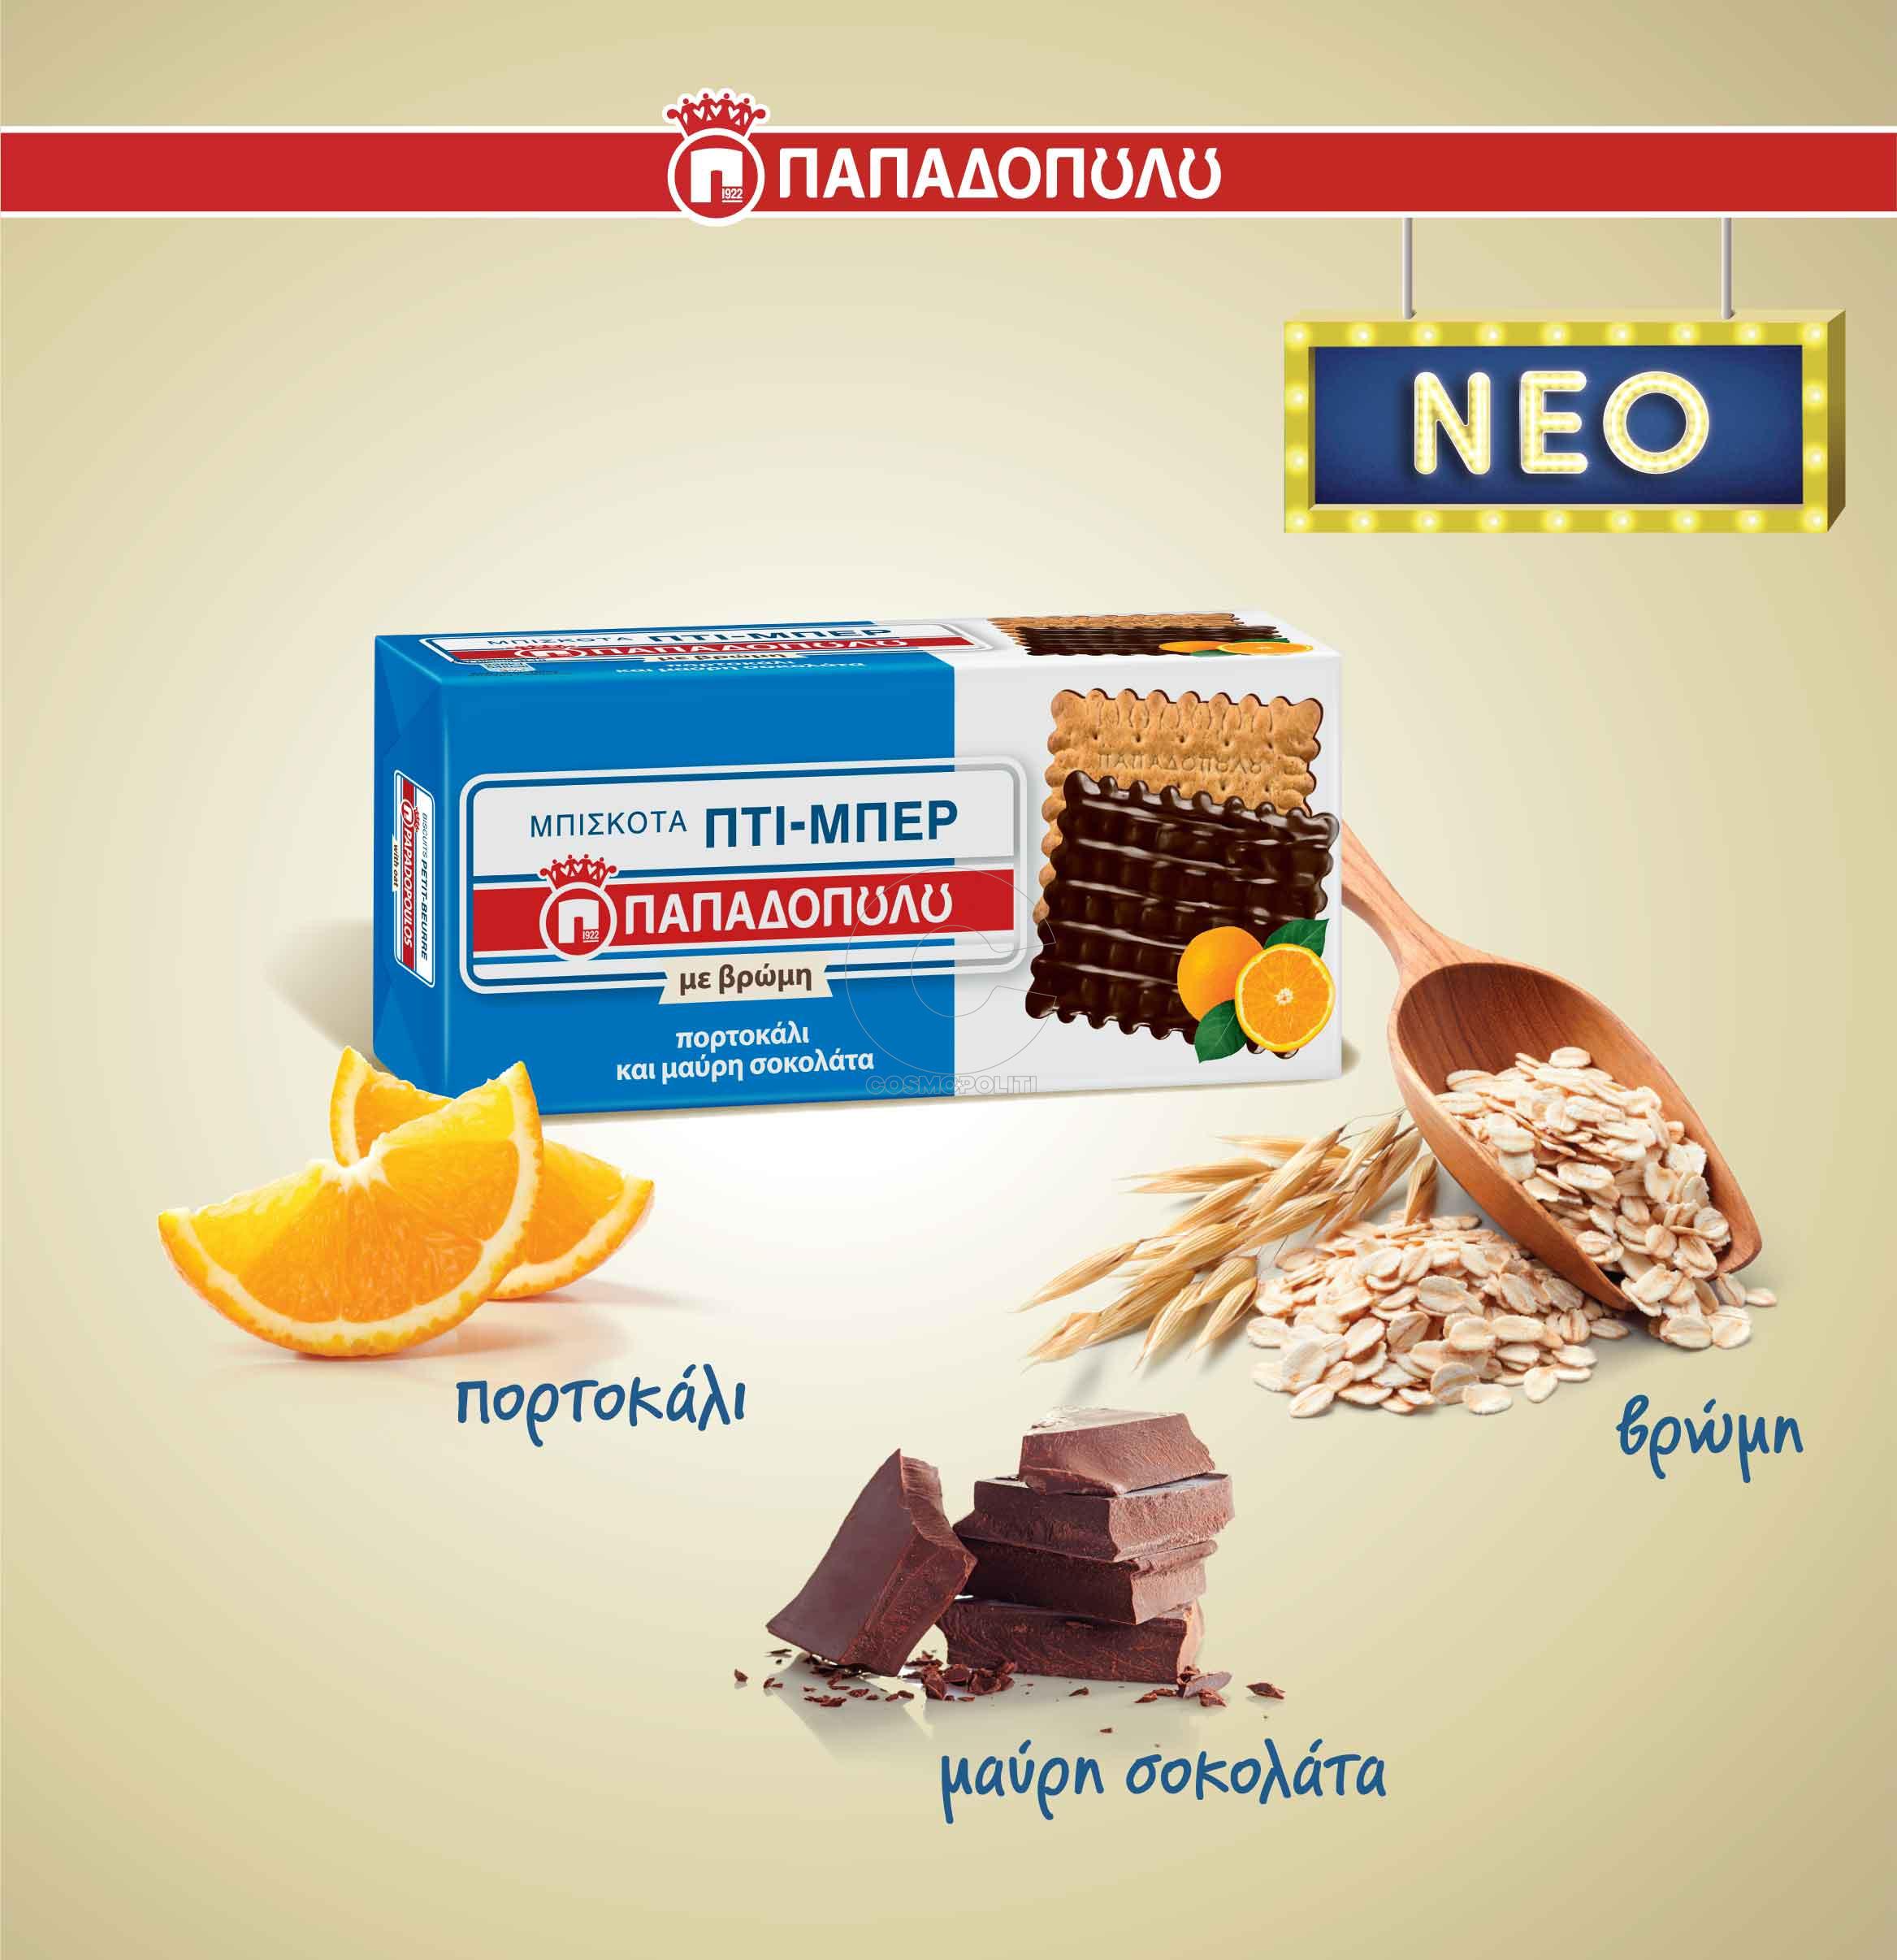 Petit_beurre Βρώμη Σοκολάτα Πορτοκάλι